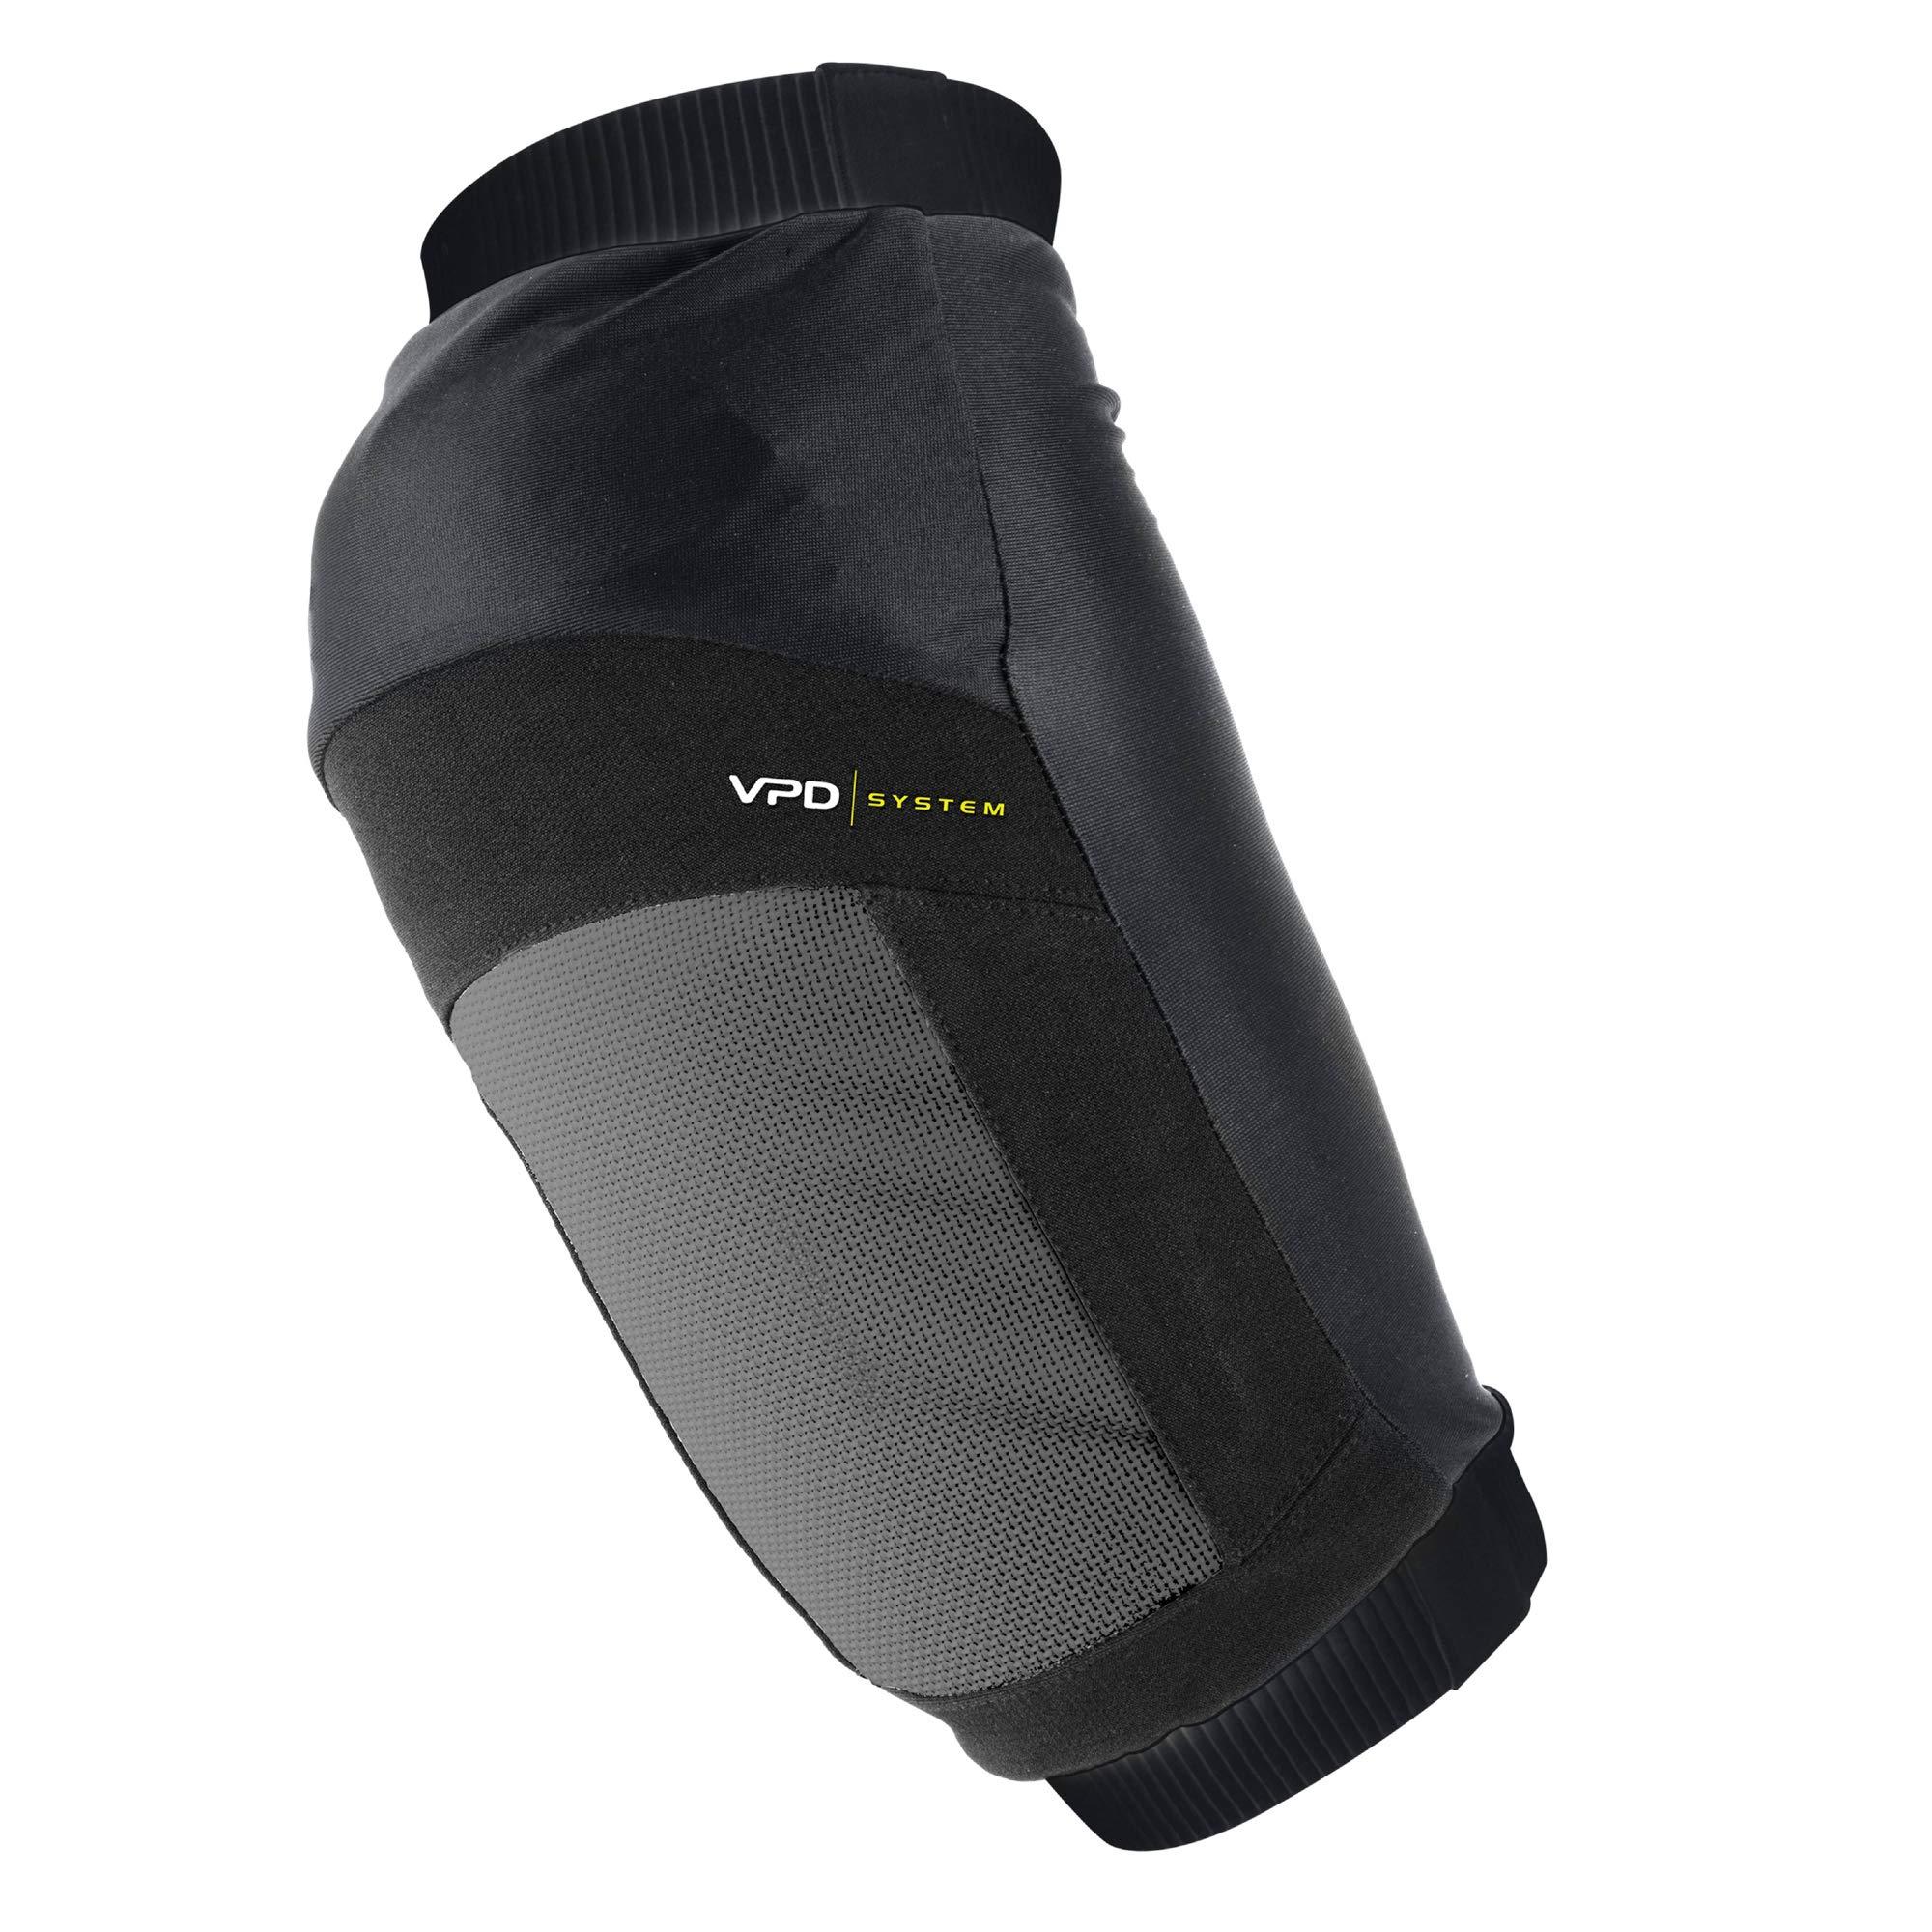 POC Joint VPD System Elbow Prodektor, Uranium Black, Small